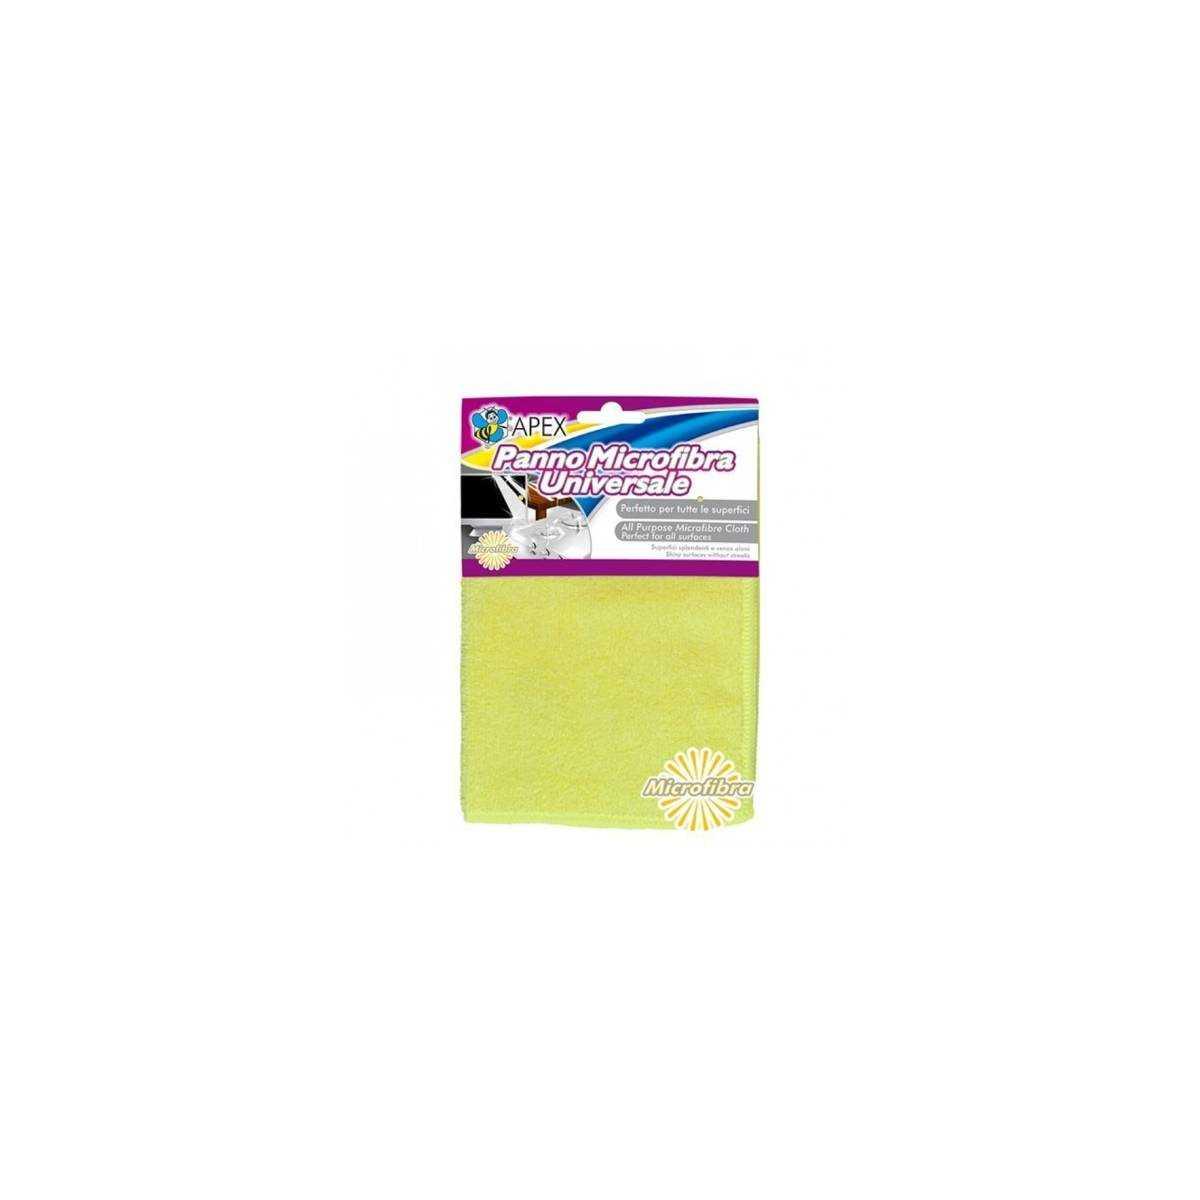 Салфетка All-Purpose Microfibre 9970 APEX - Fratelli Re SpA